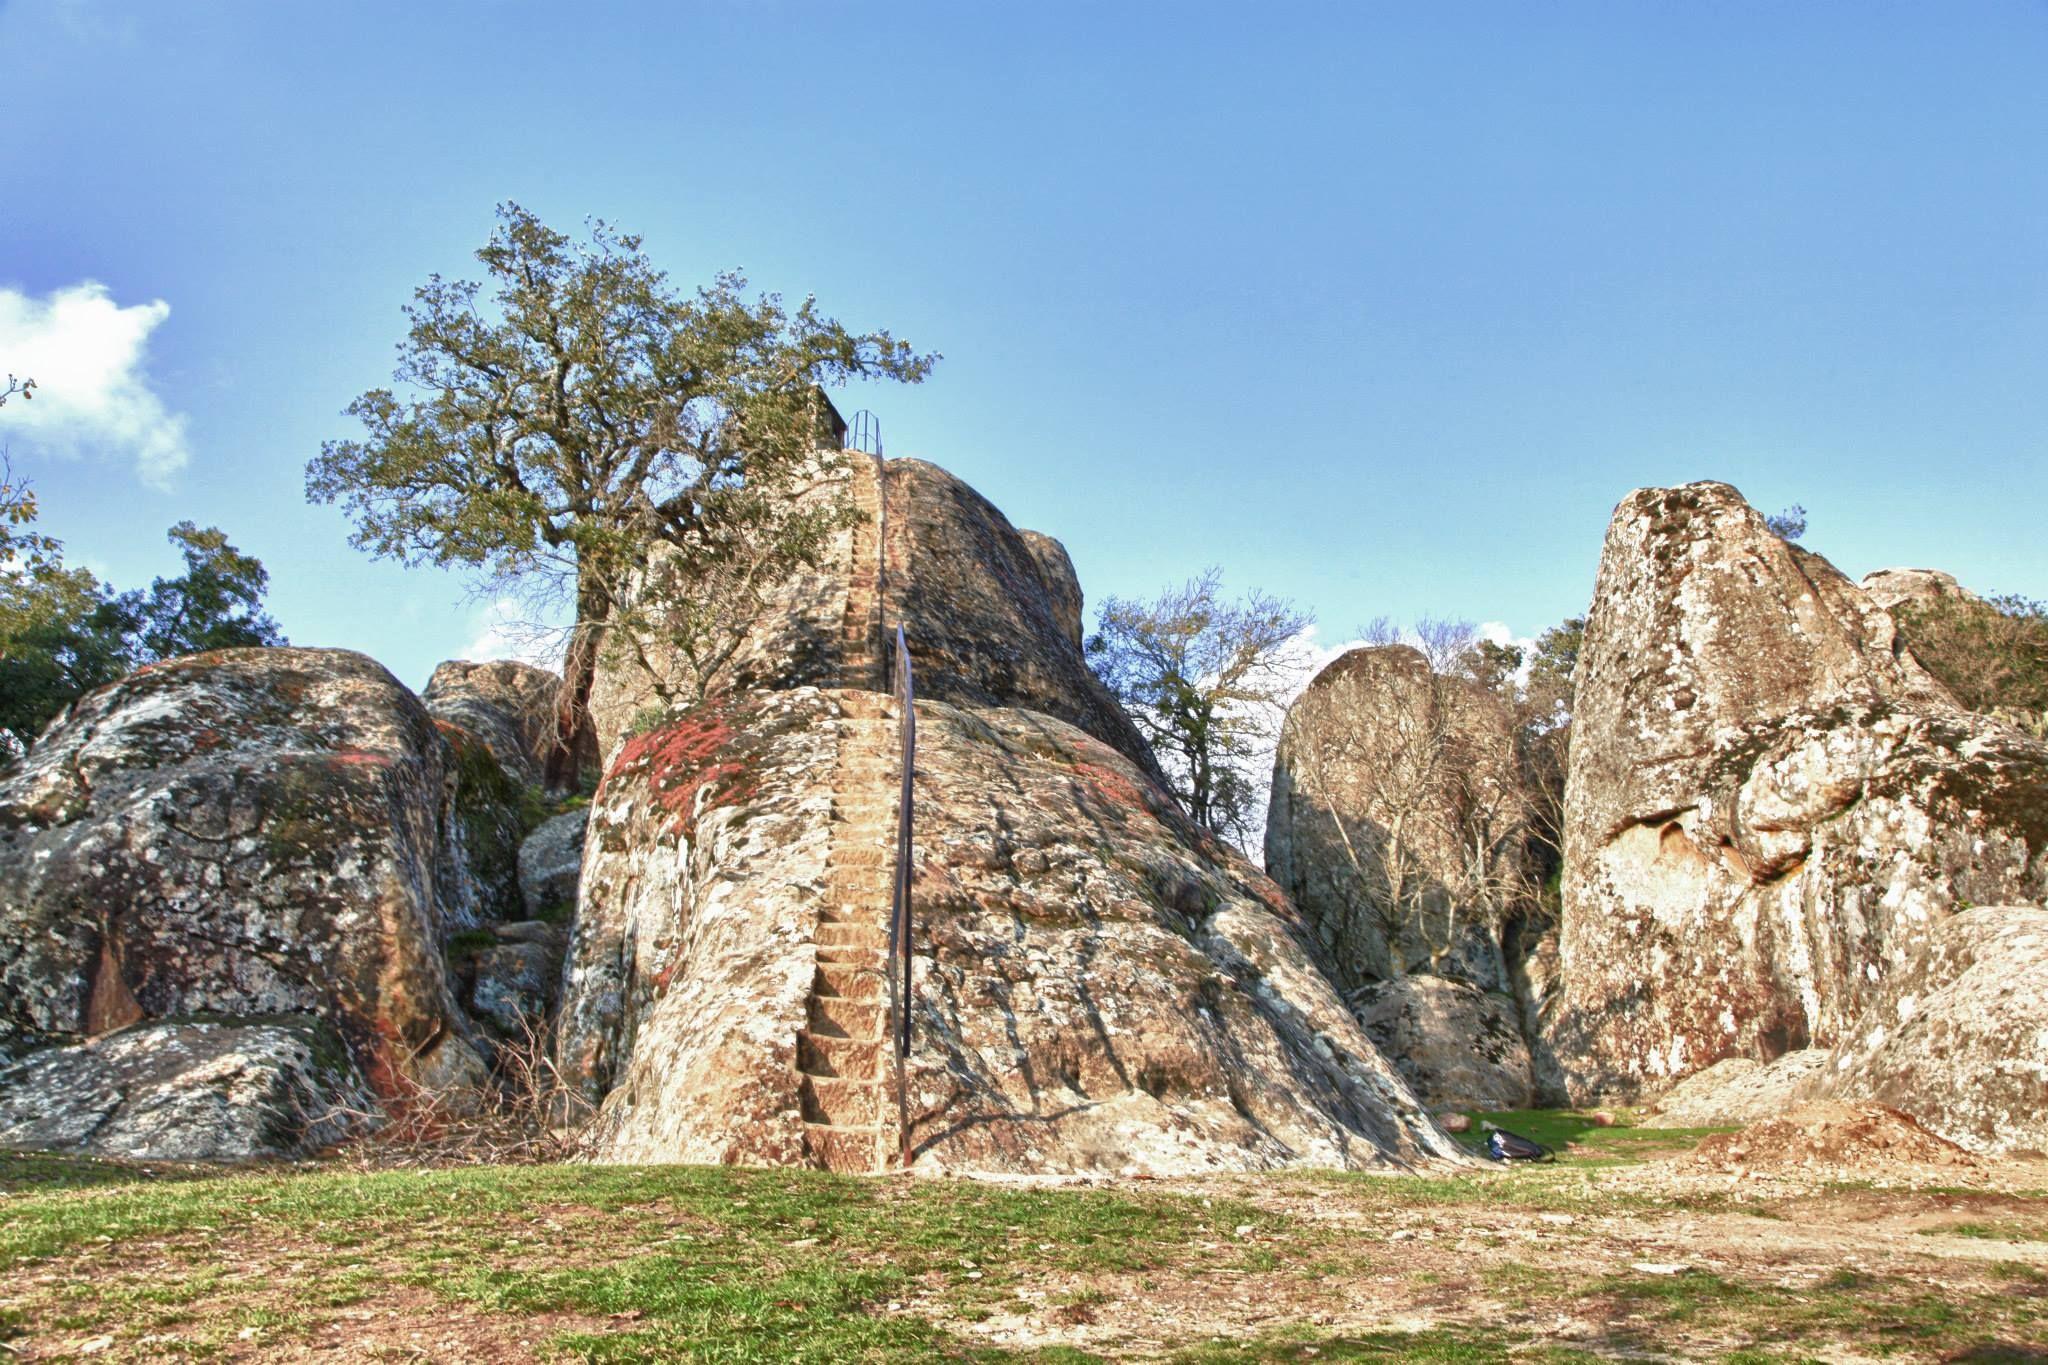 El Feija National Park